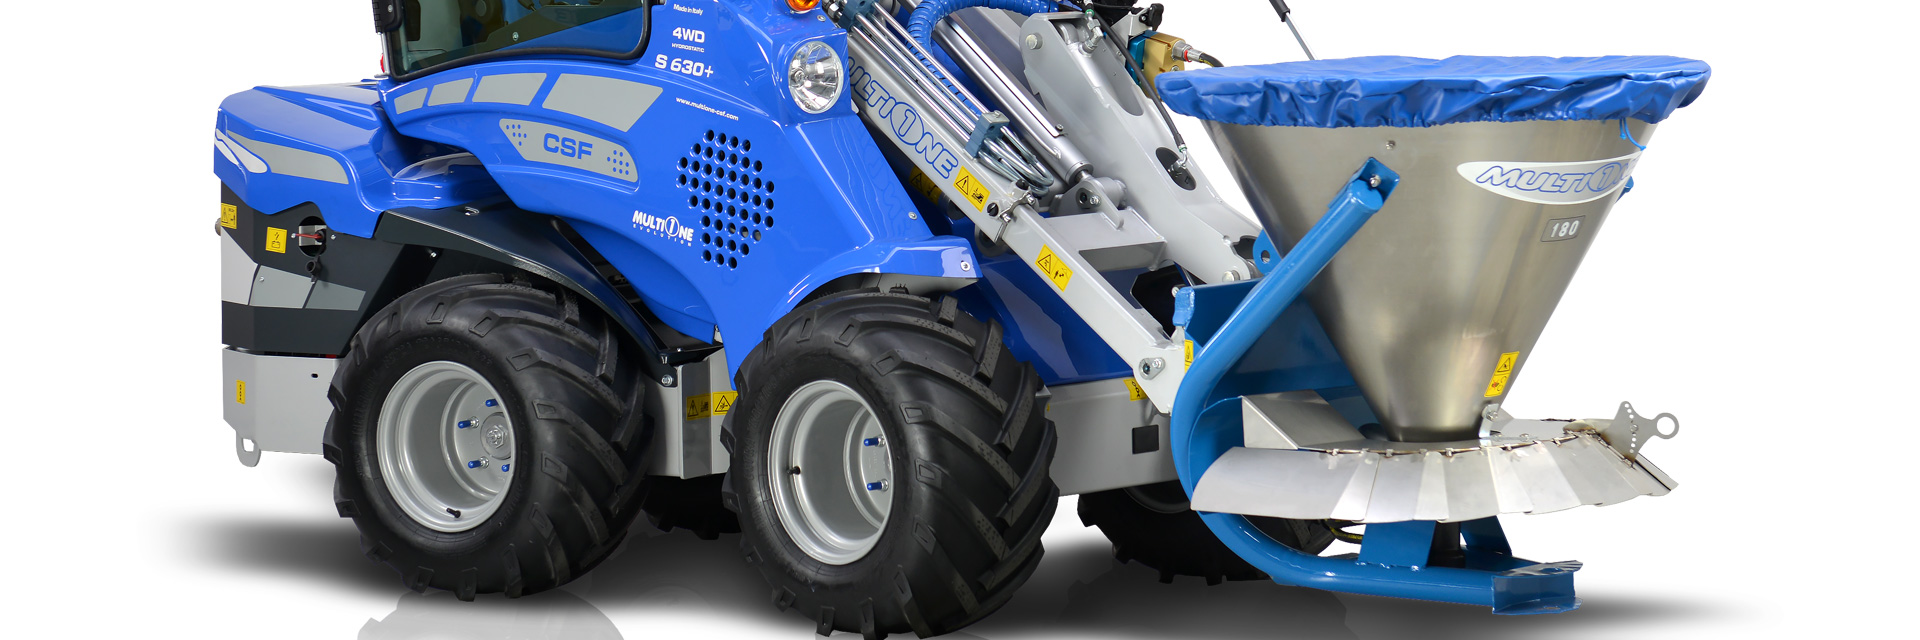 Multione-salt-and-sand-spreder for mini excavator